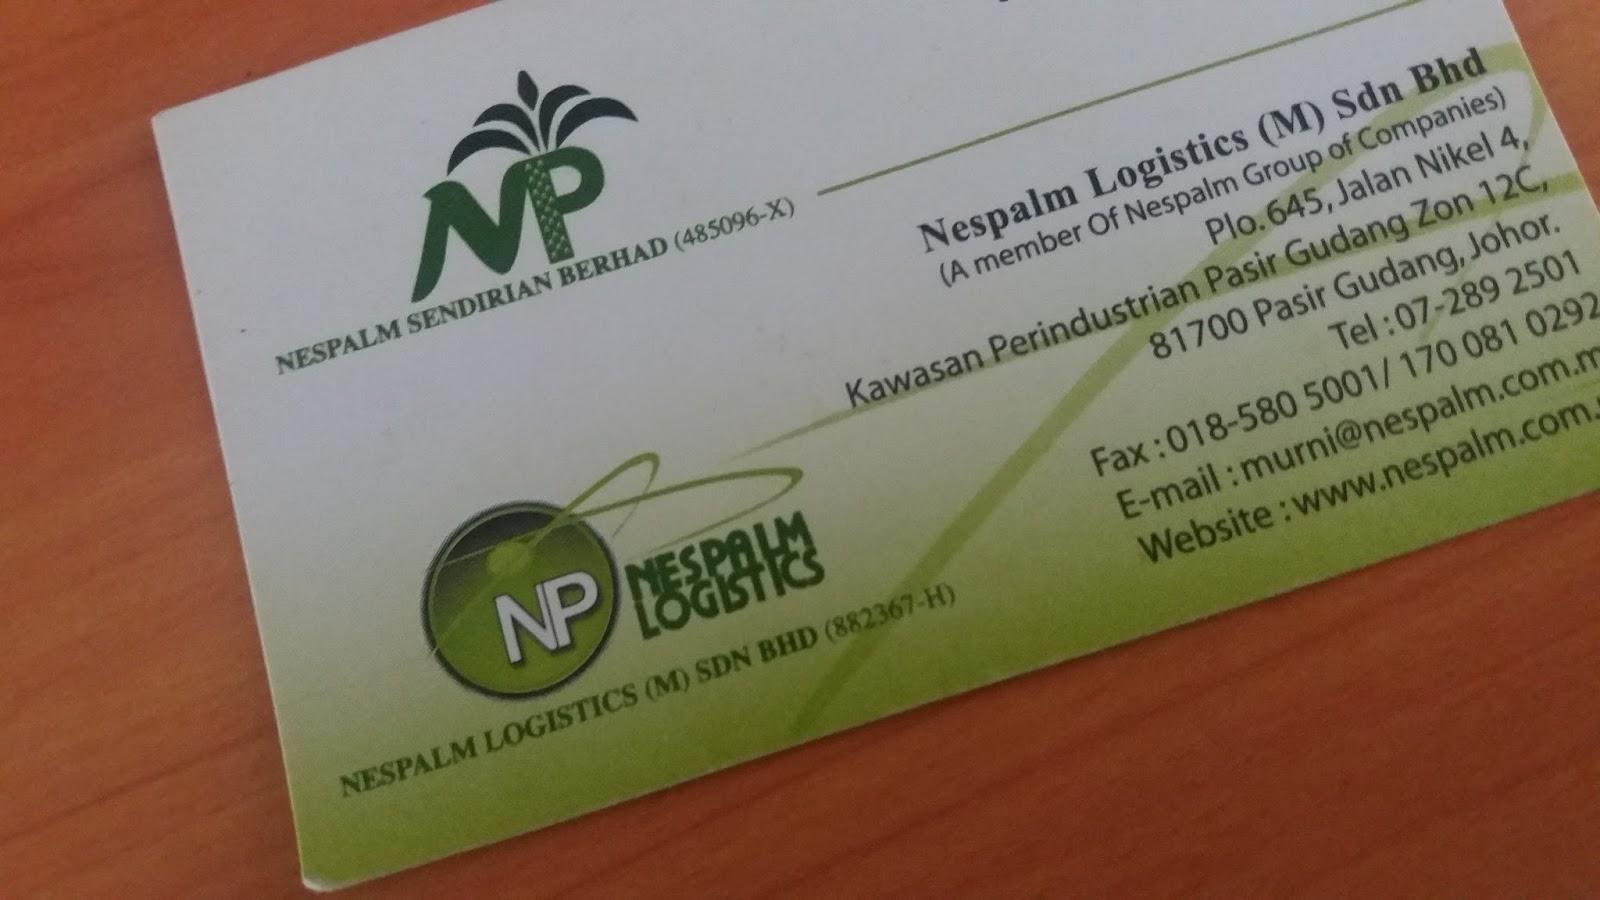 Nespalm Logistic Company